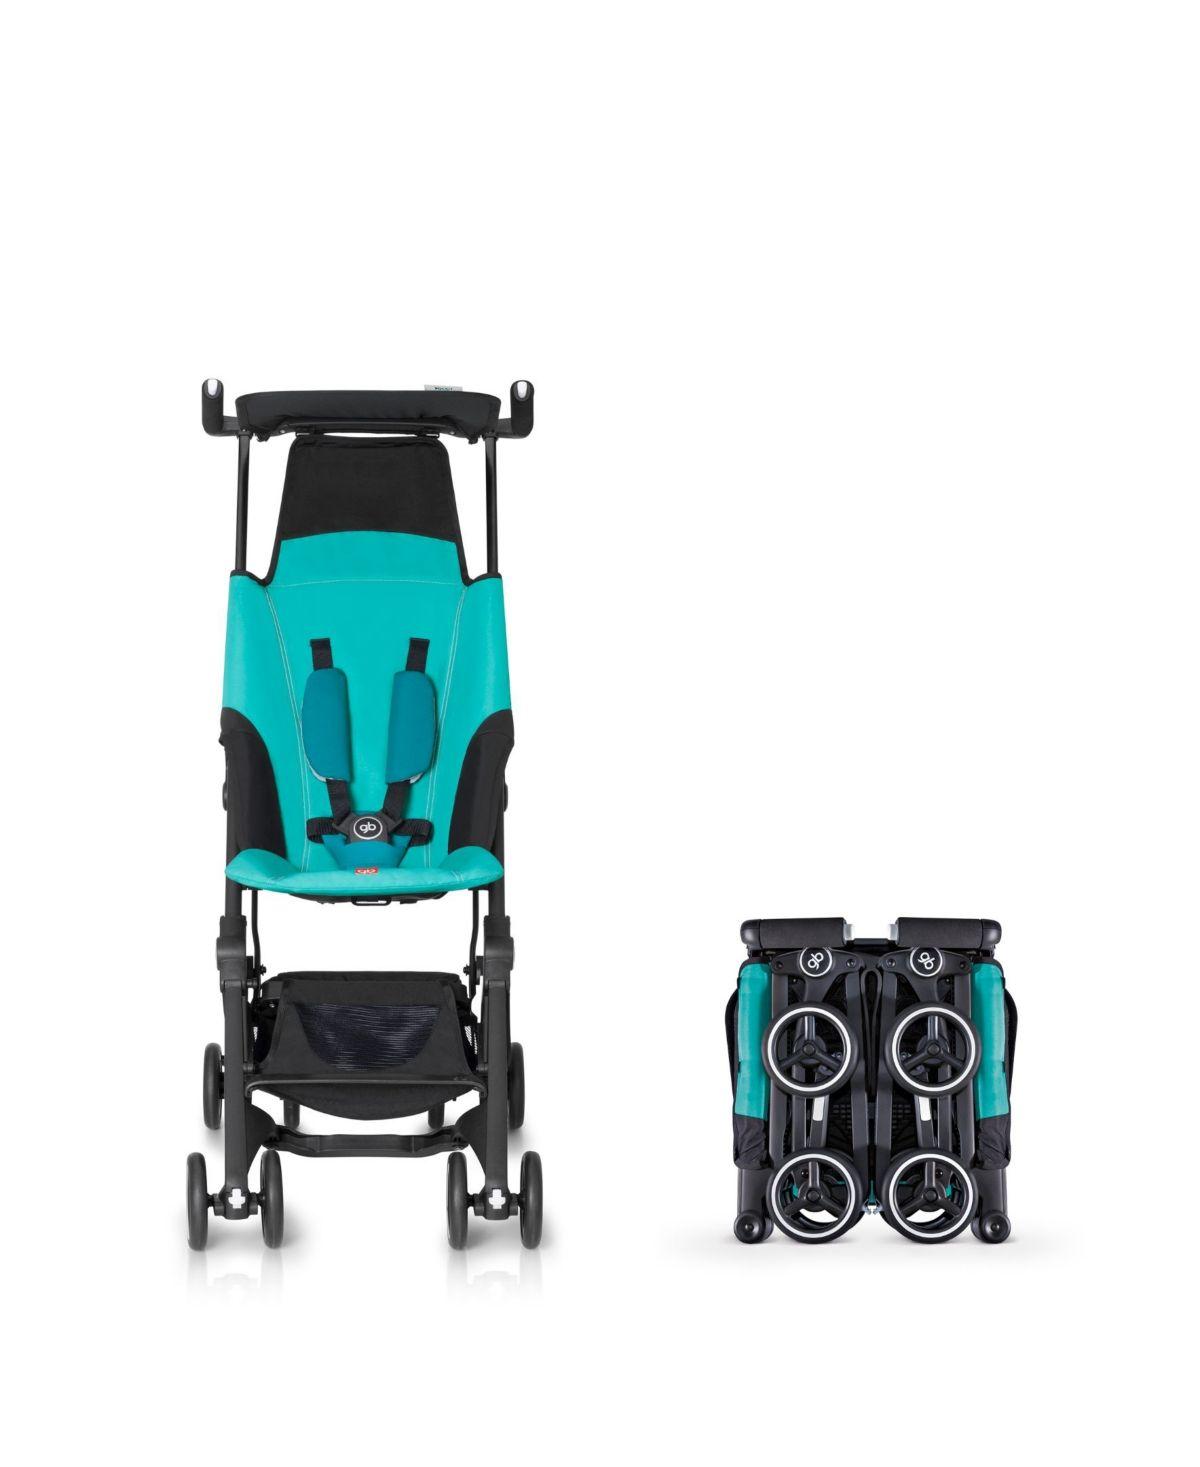 19+ Gb stroller pockit review info